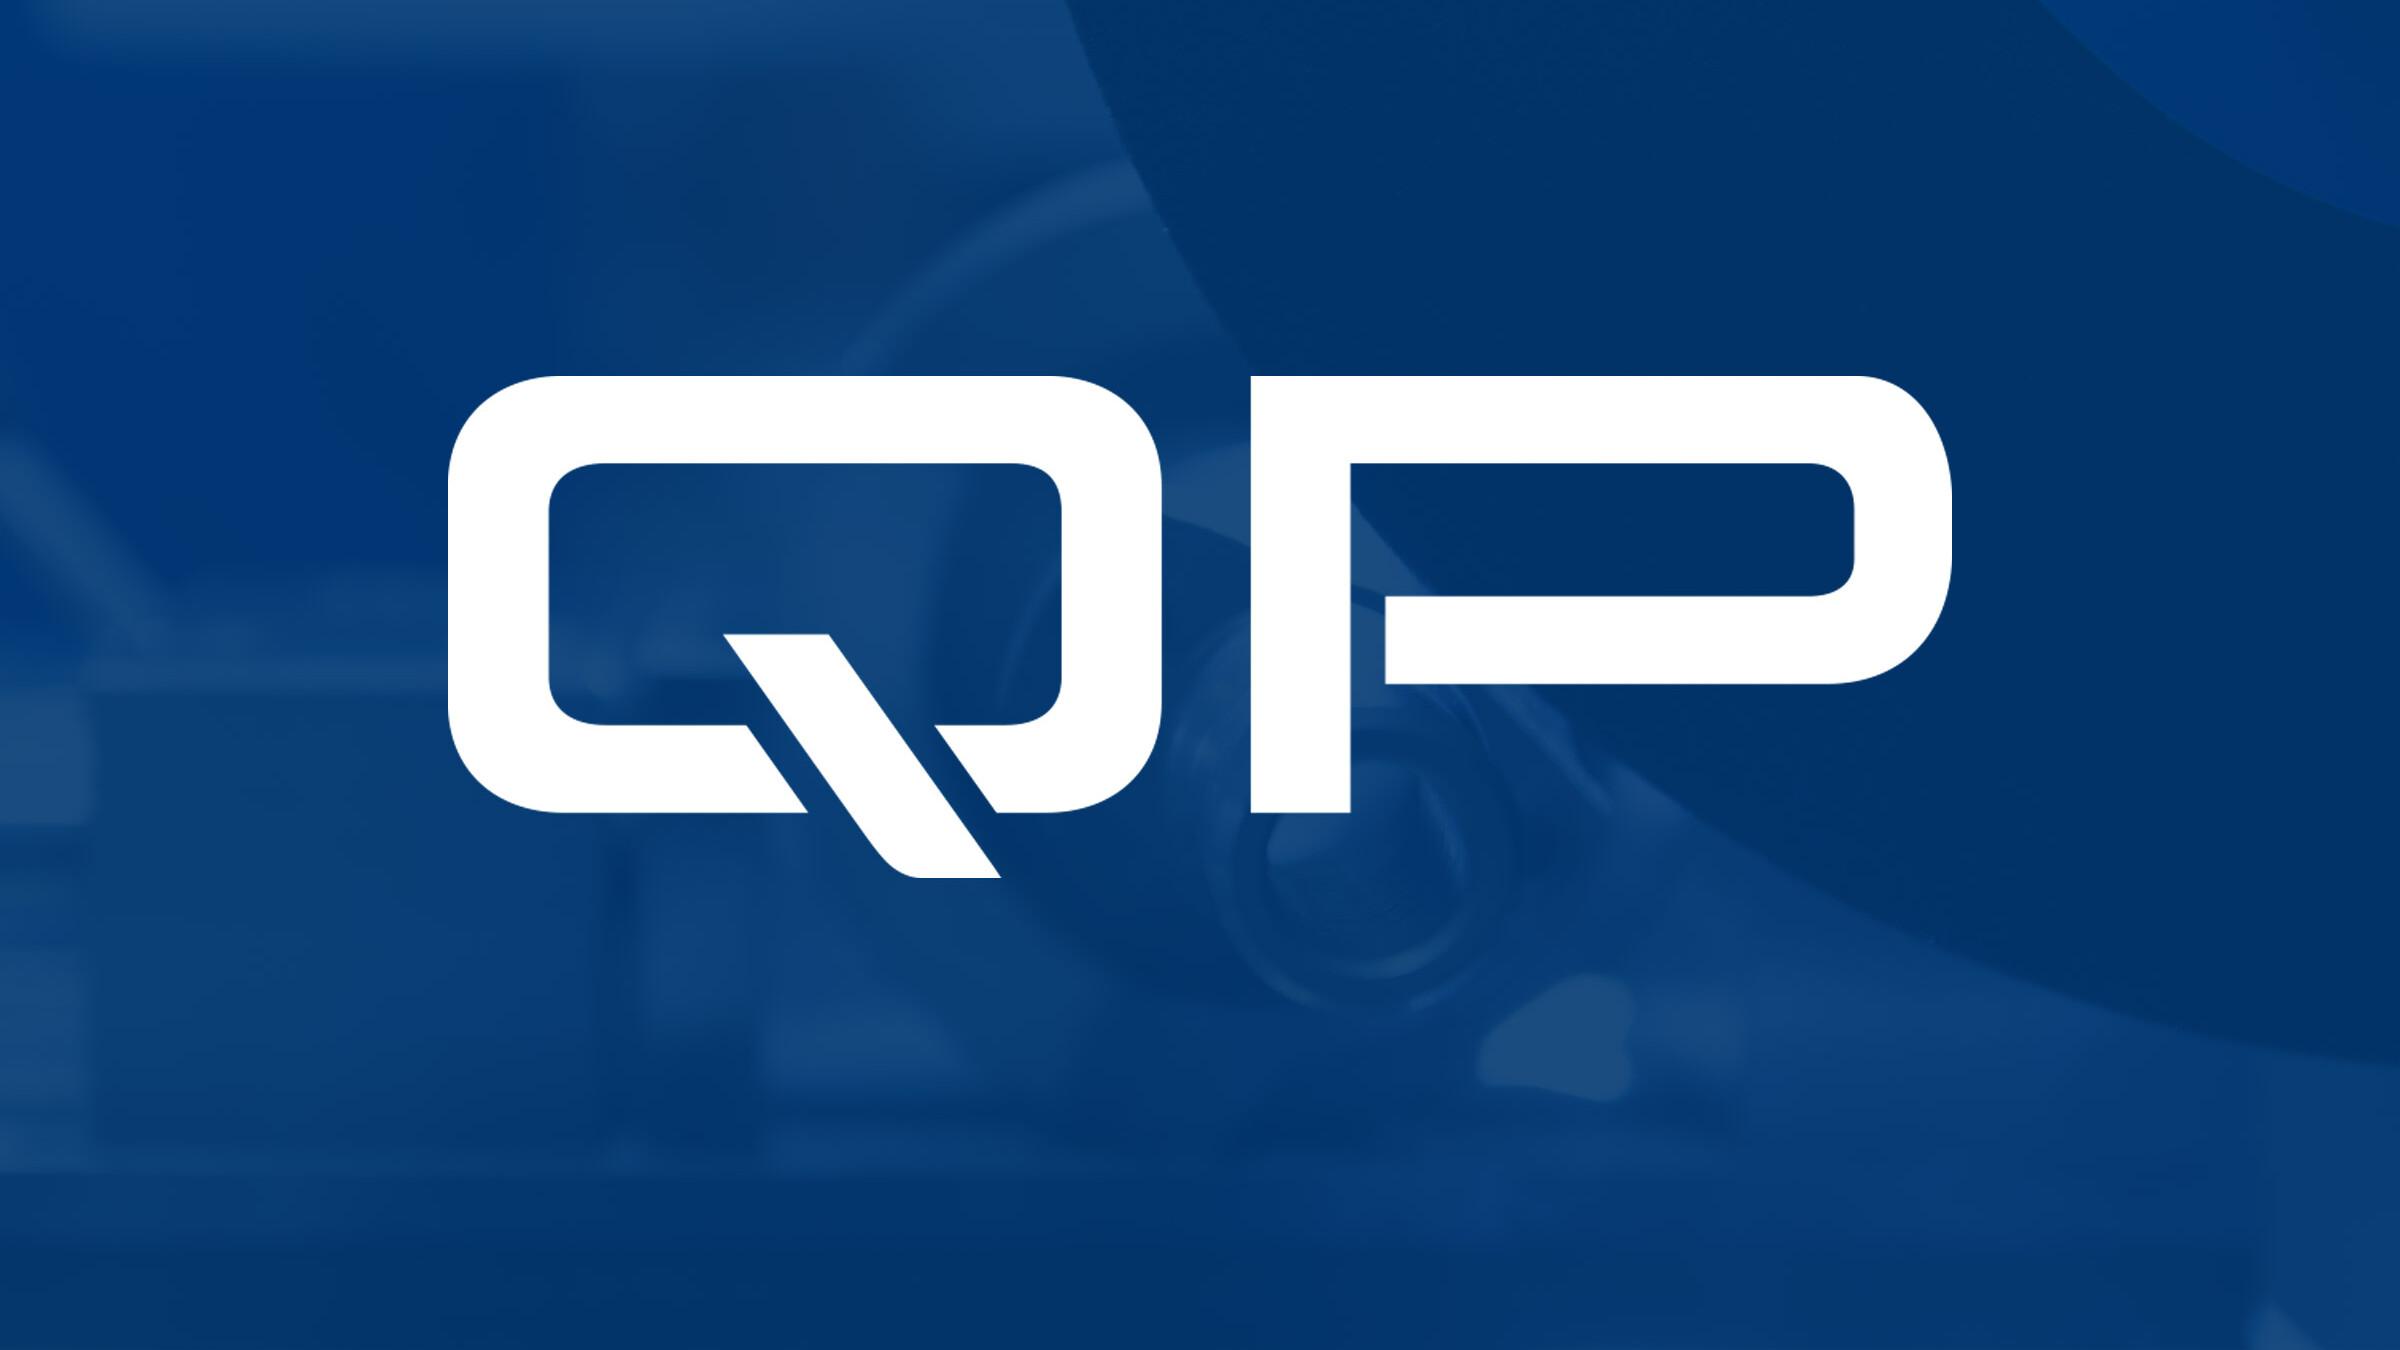 QP Gruppe Corporate Identity